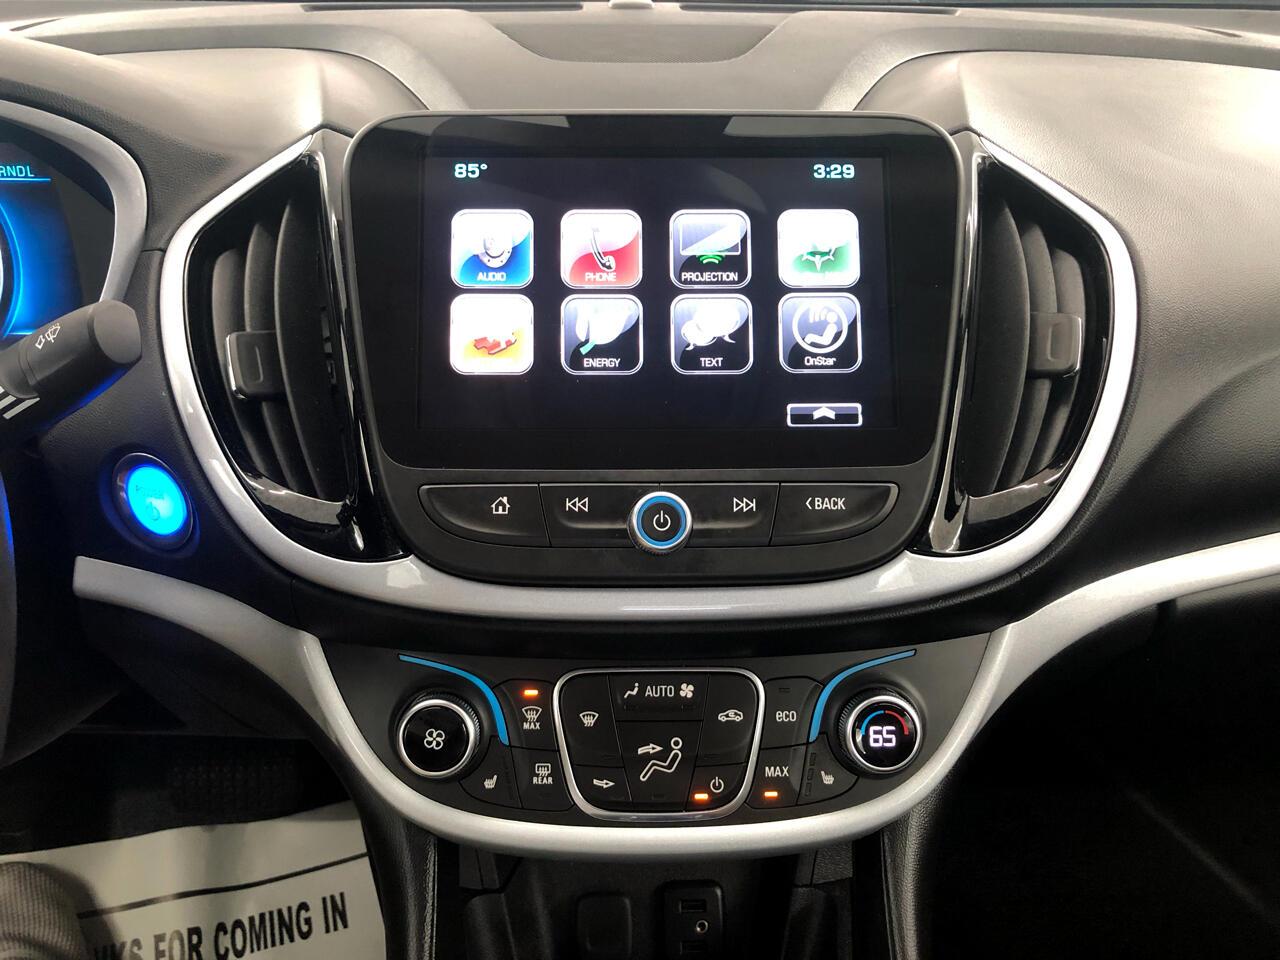 2017 Chevrolet Volt 5dr HB LT